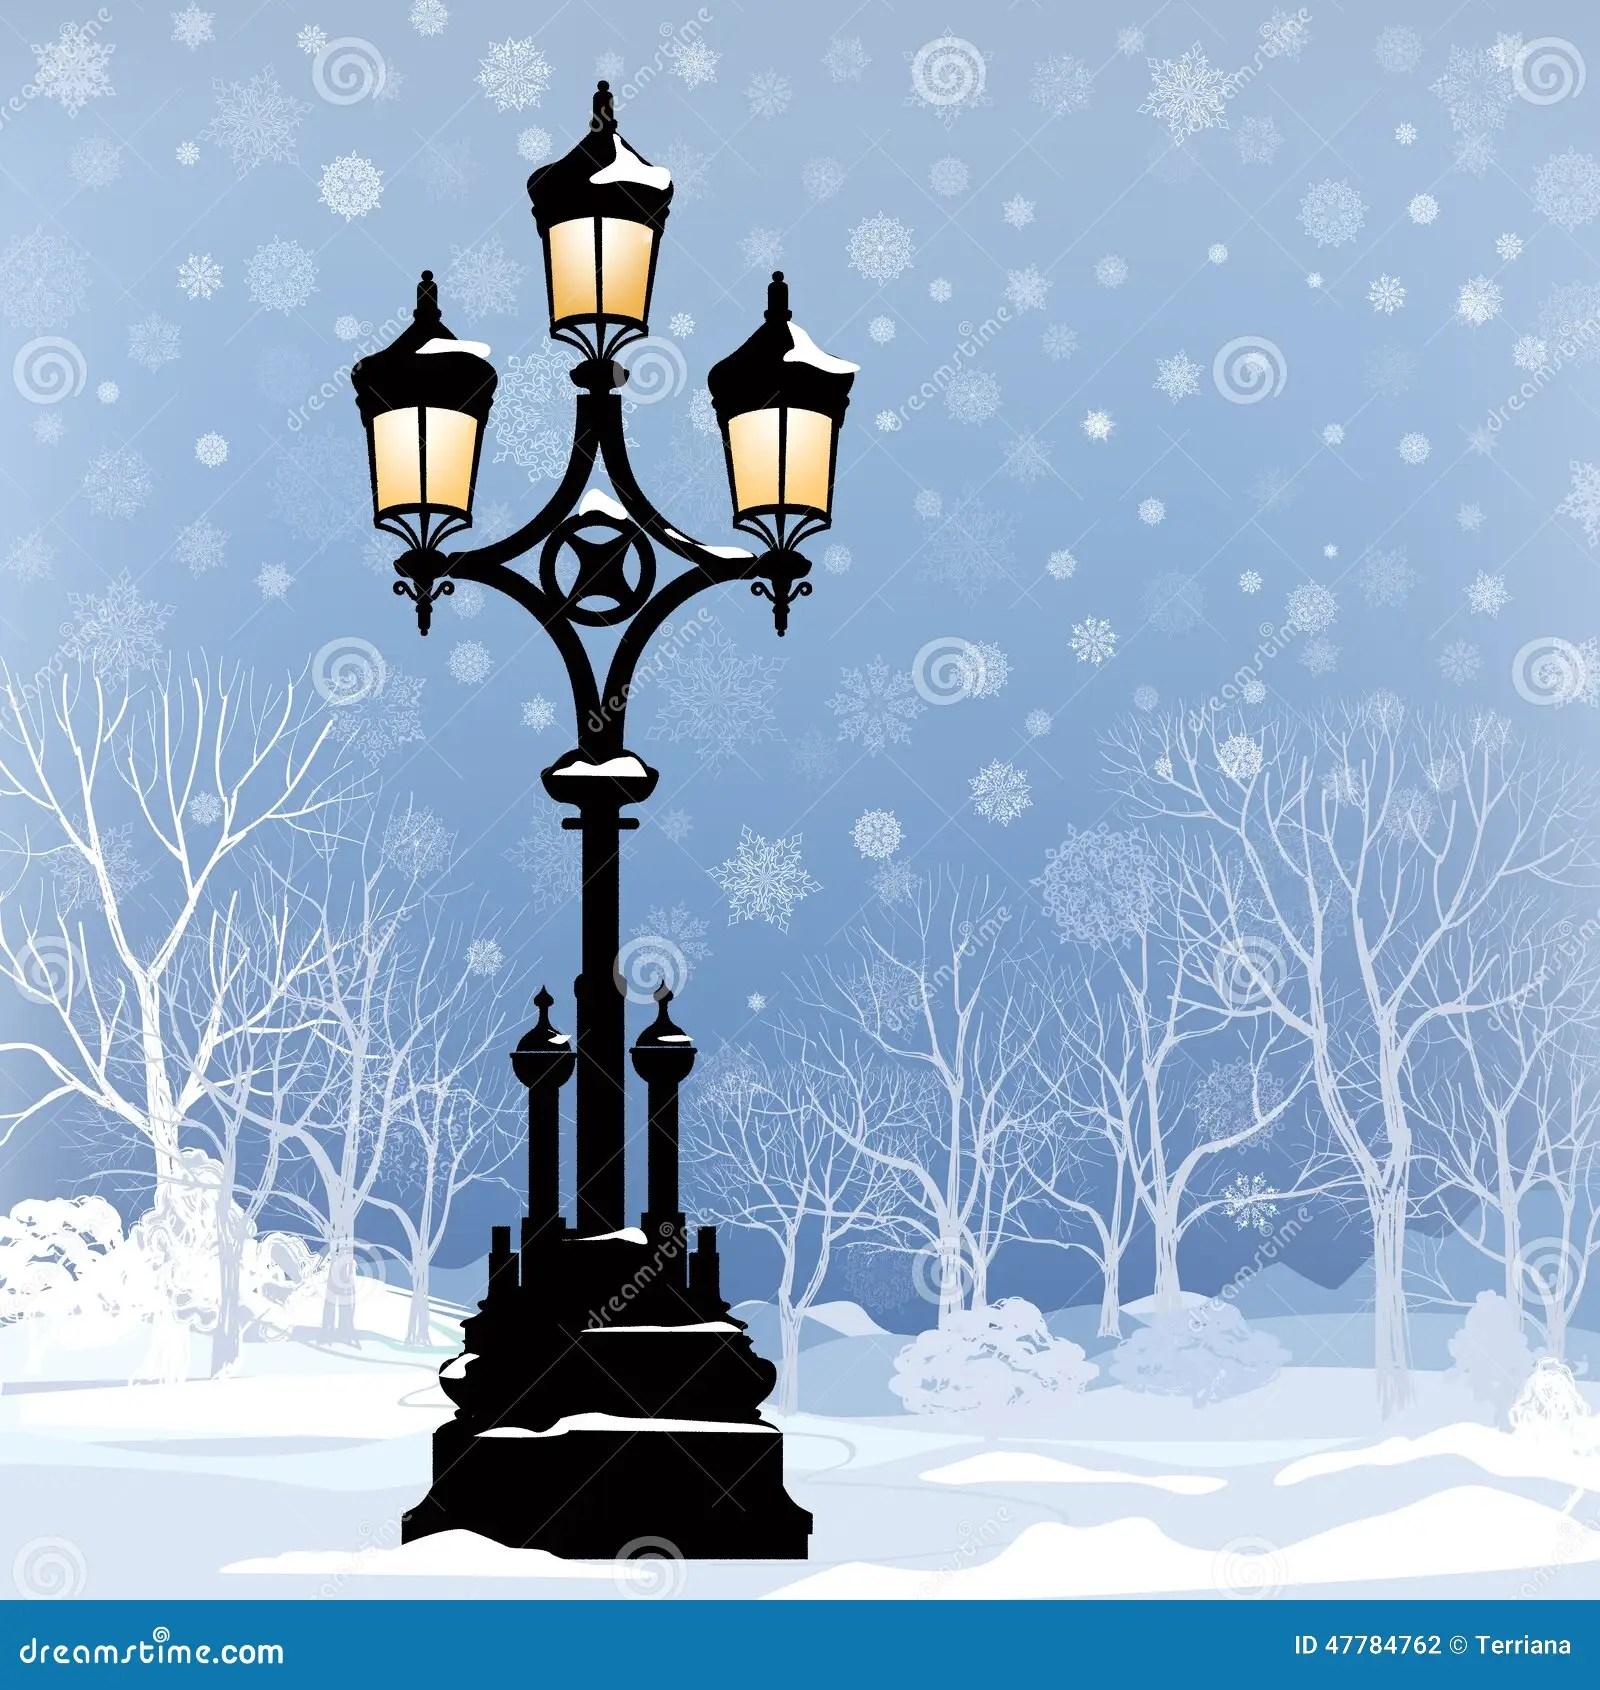 Christmas Winter Cityscape With Luminous Street Lamp, Snow